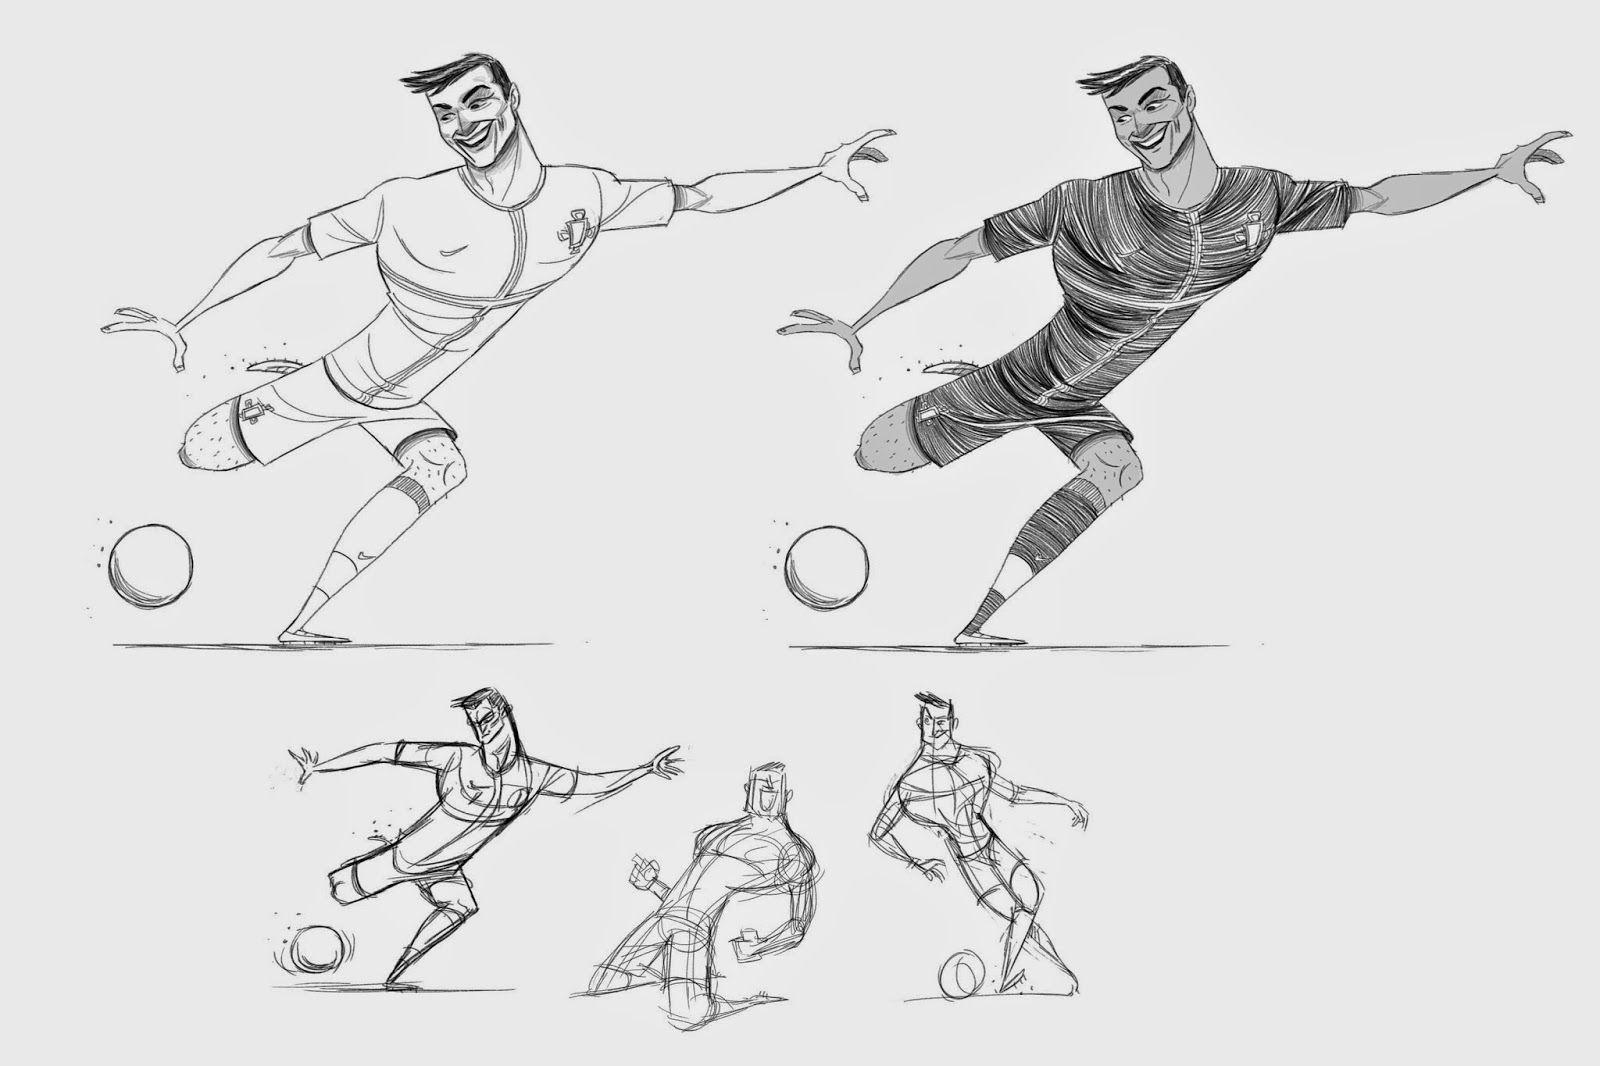 Http Gilli Bean Blogspot Be 2014 06 Nike Last Game Html Illustration Character Design Character Design References